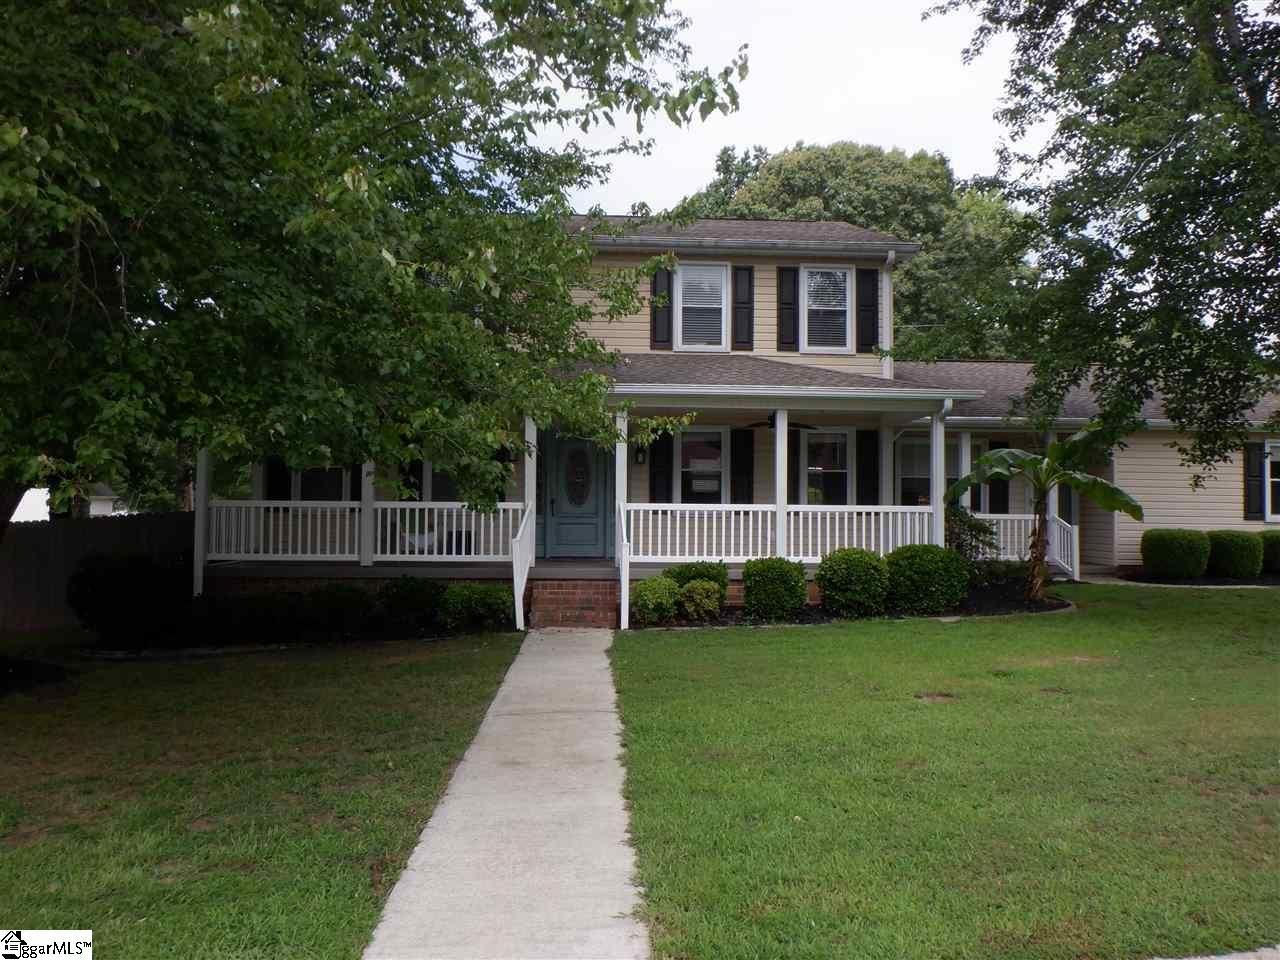 404 Wemberly Lane, Simpsonville, SC 29681-3849 - MLS#: 1424156